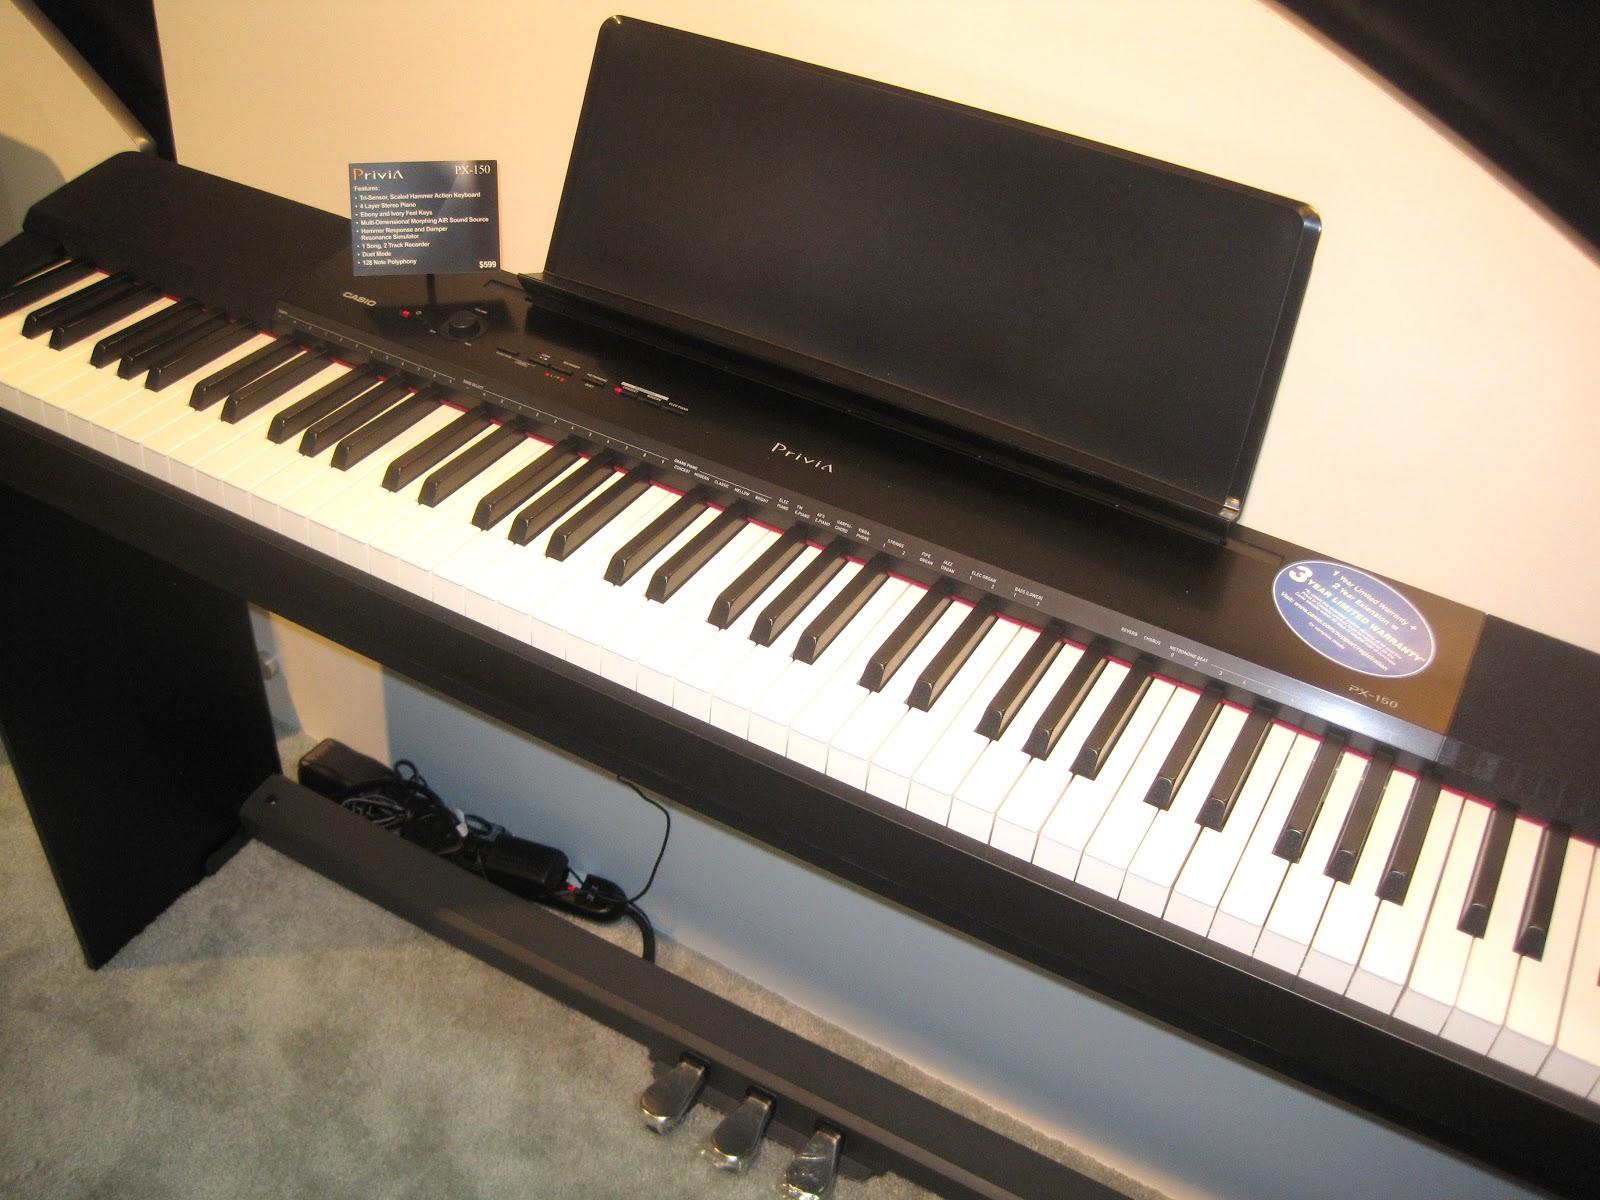 Digital Piano Casio Vs Yamaha : az piano reviews review yamaha p35 vs casio cdp120 vs casio cdp130 digital pianos under 500 ~ Russianpoet.info Haus und Dekorationen